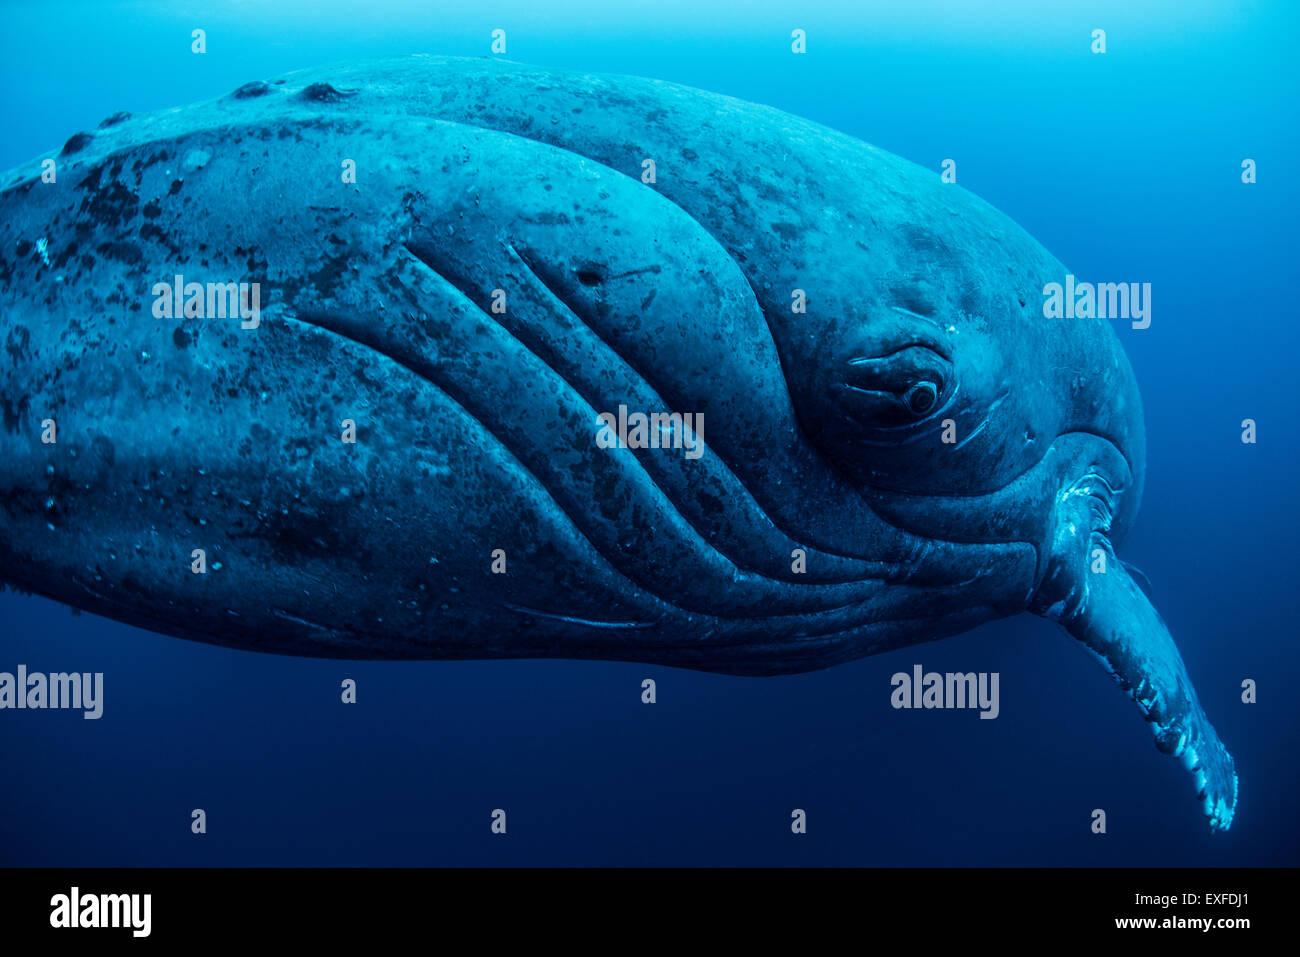 Curious female humpback whale, closeup, Roca Partida, Revillagigedo, Mexico - Stock Image